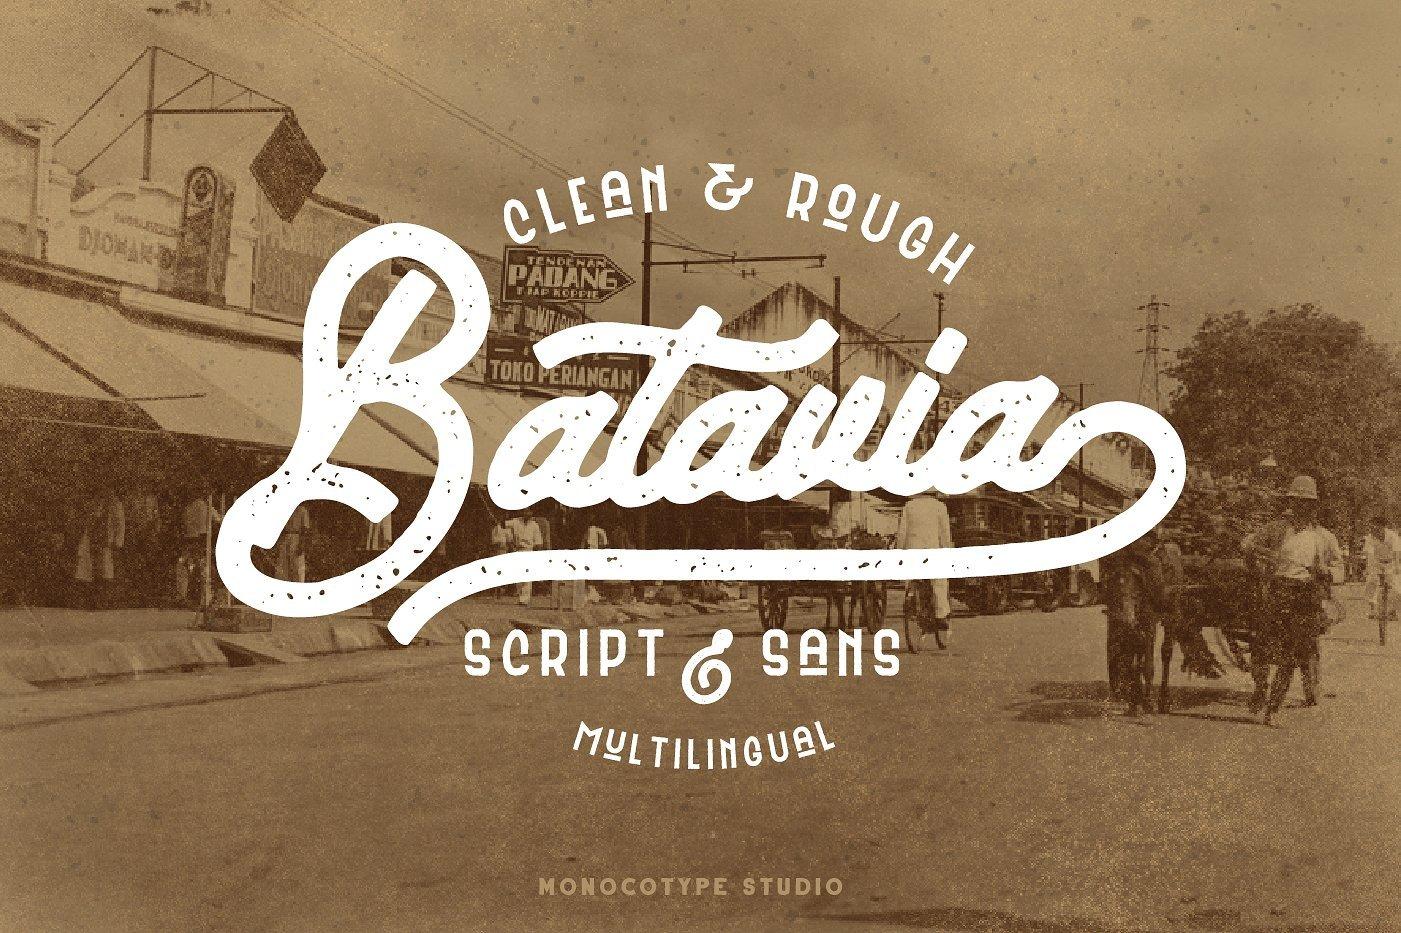 https://fontclarity.com/wp-content/uploads/2019/09/batavia-typeface-download-0.jpg Free Download